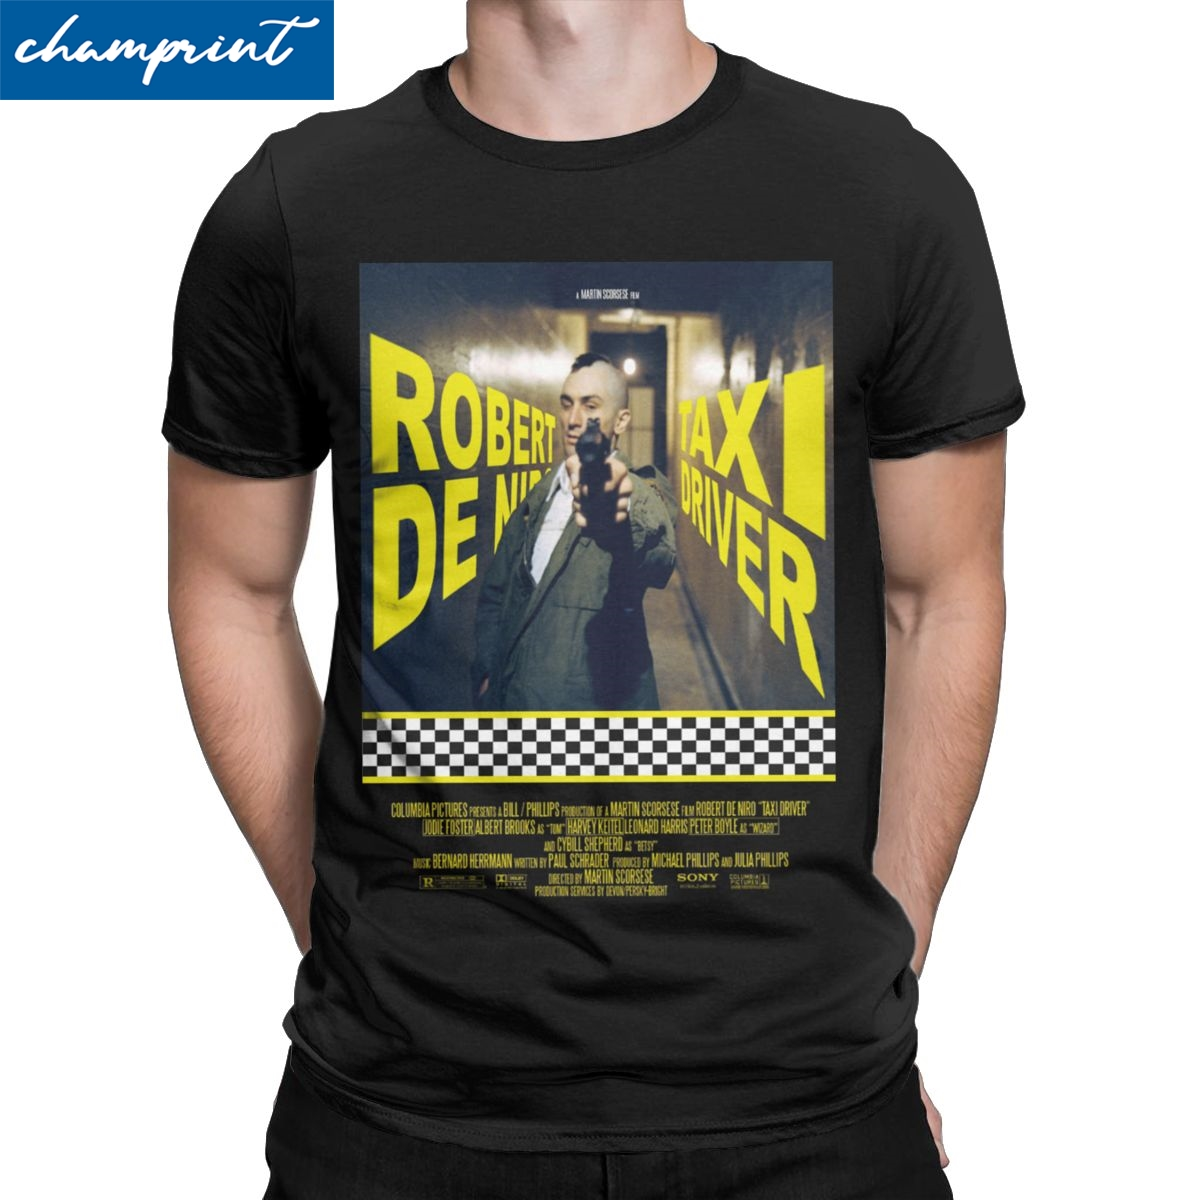 Taxi Driver T-shirt Travis Bickle Disturbia Retro Robert De Niro Hipster 70s 80